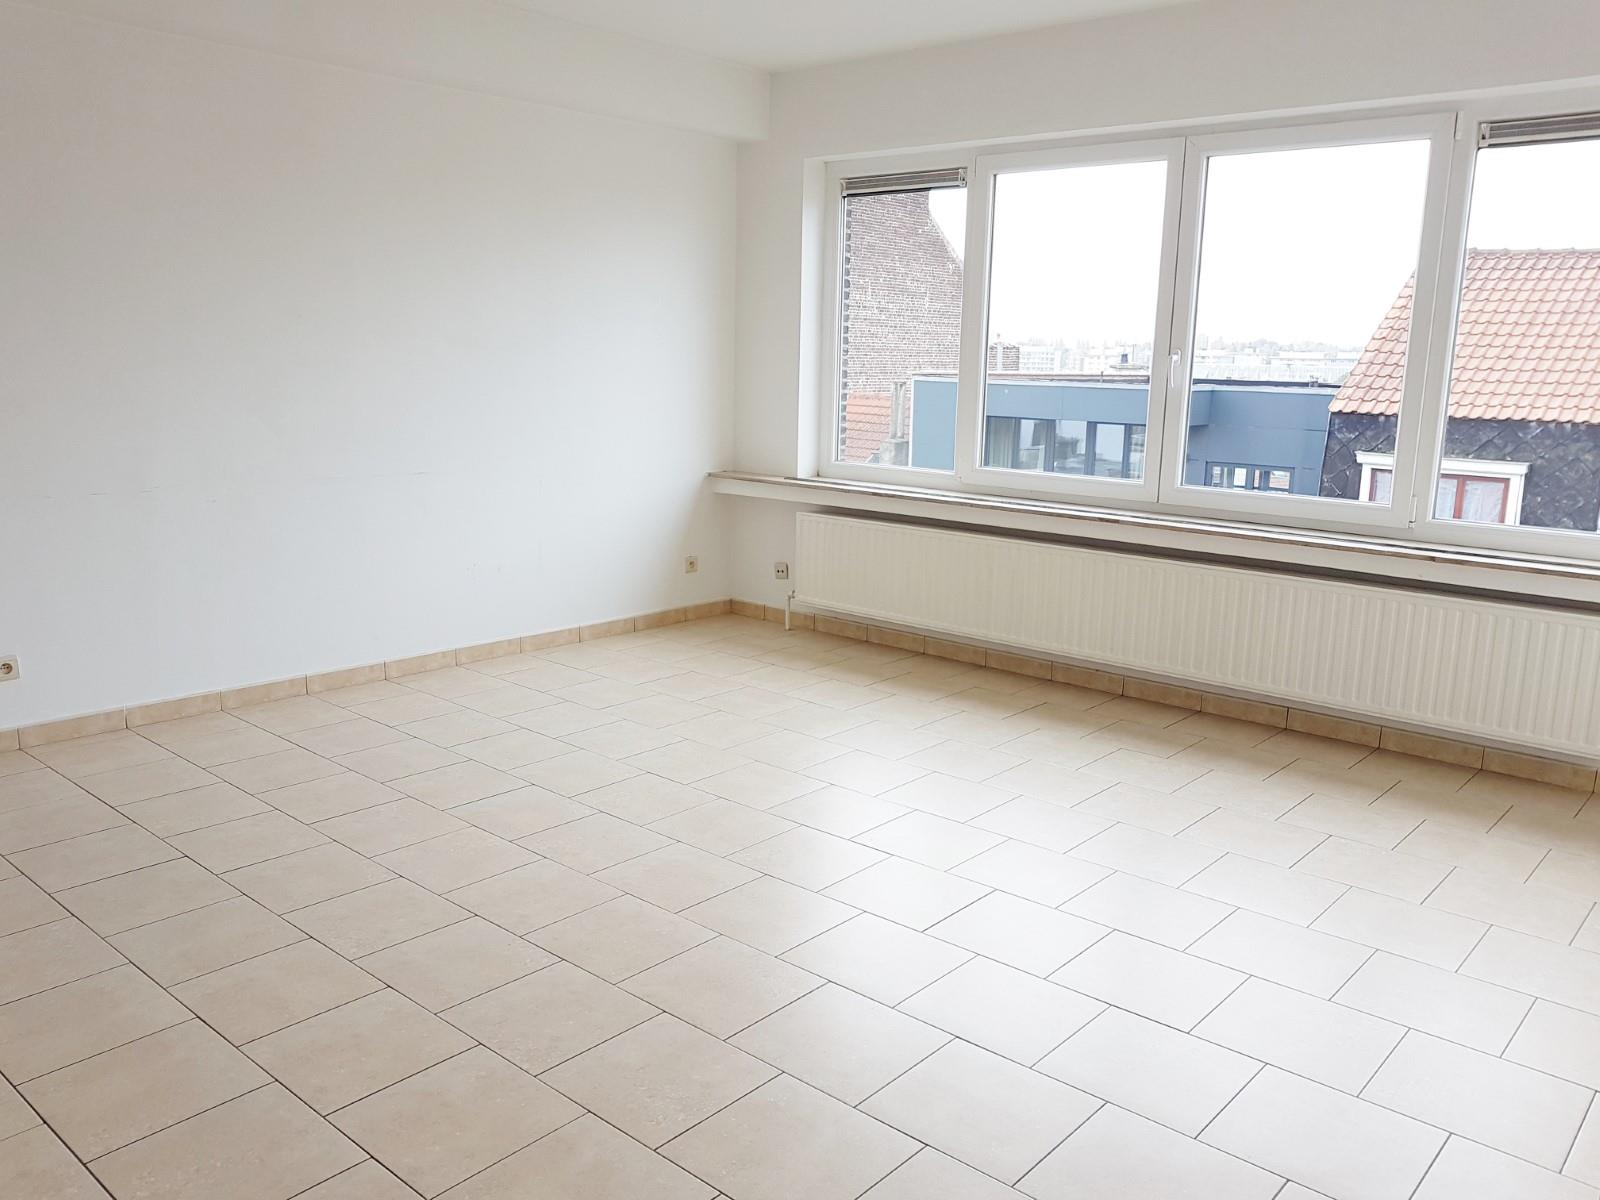 Appartement - Auderghem - #3601552-1